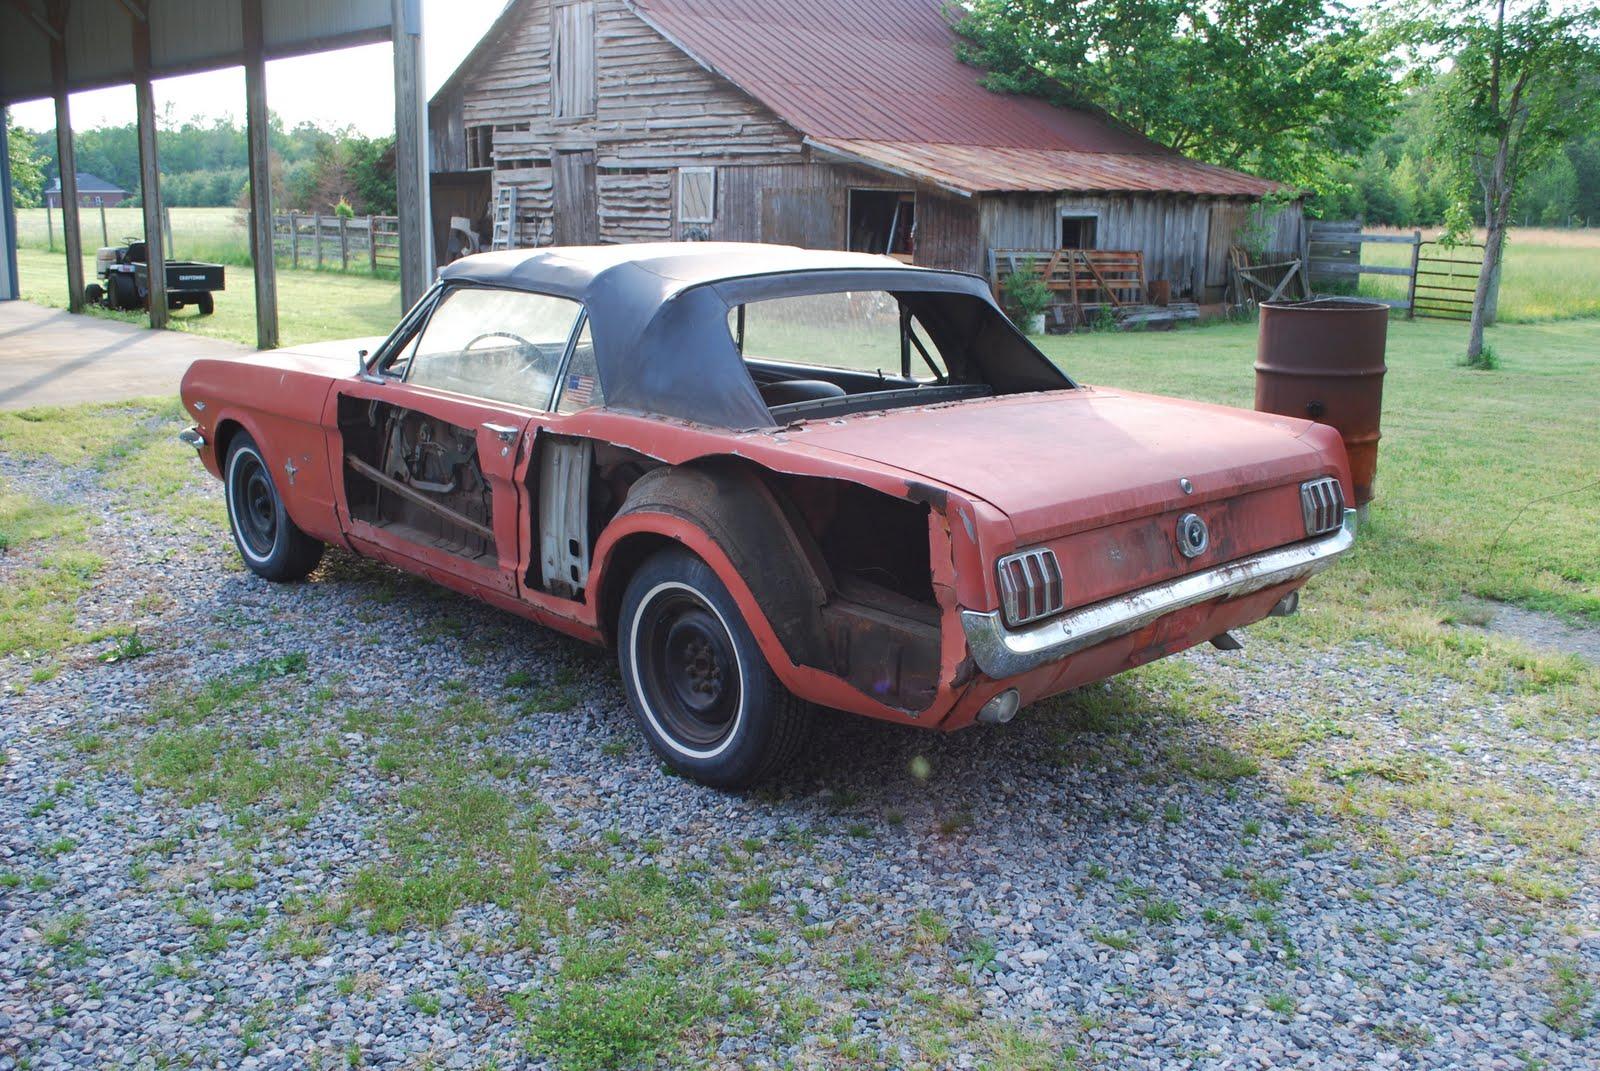 67 Mustang Ammeter Wiring Diagram Great Design Of Gauge 1967 Instrument Panel Ford